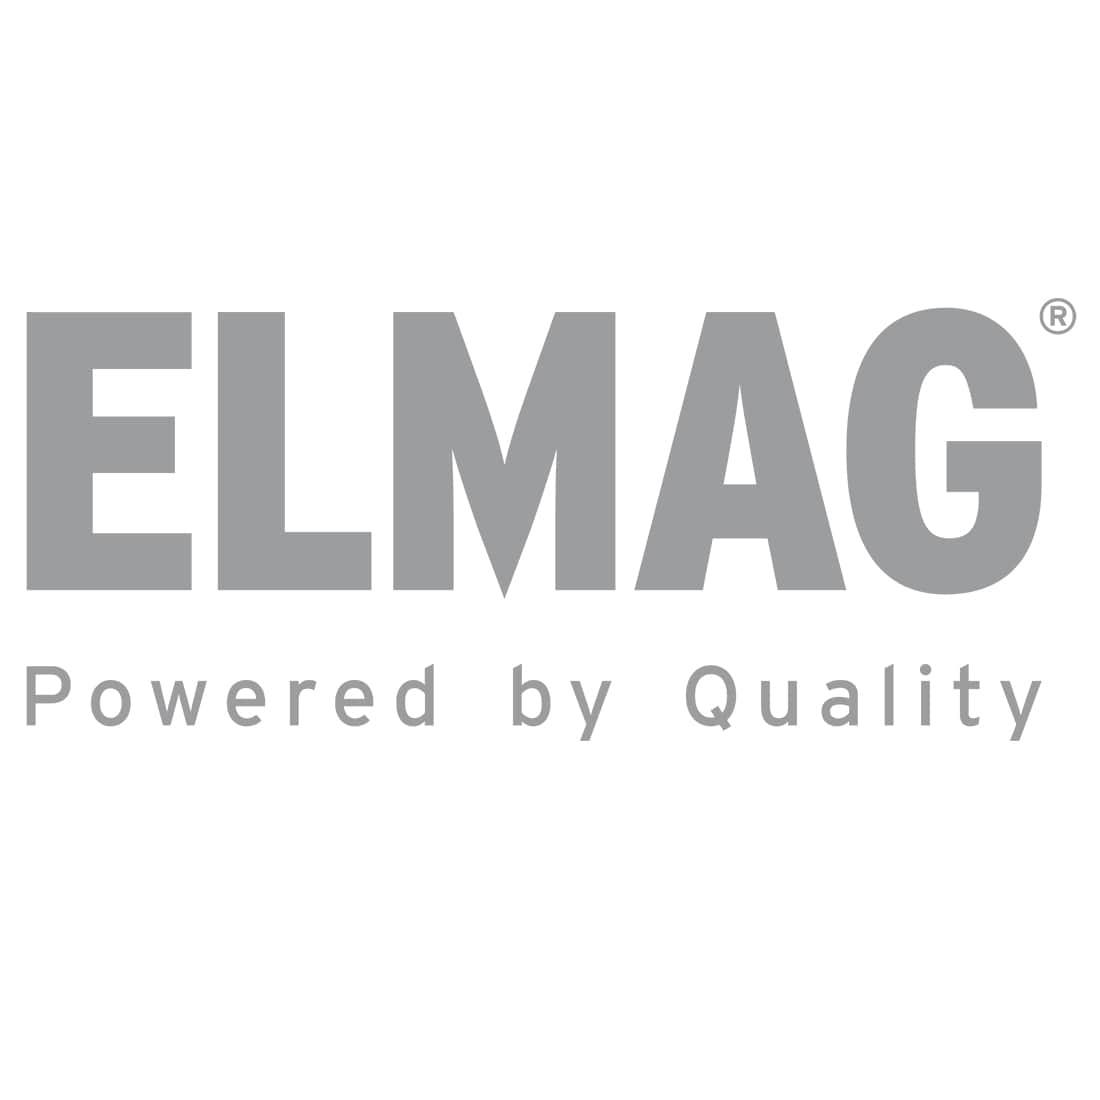 Nadelhalter für 19 Stk. 3mm Nadeln